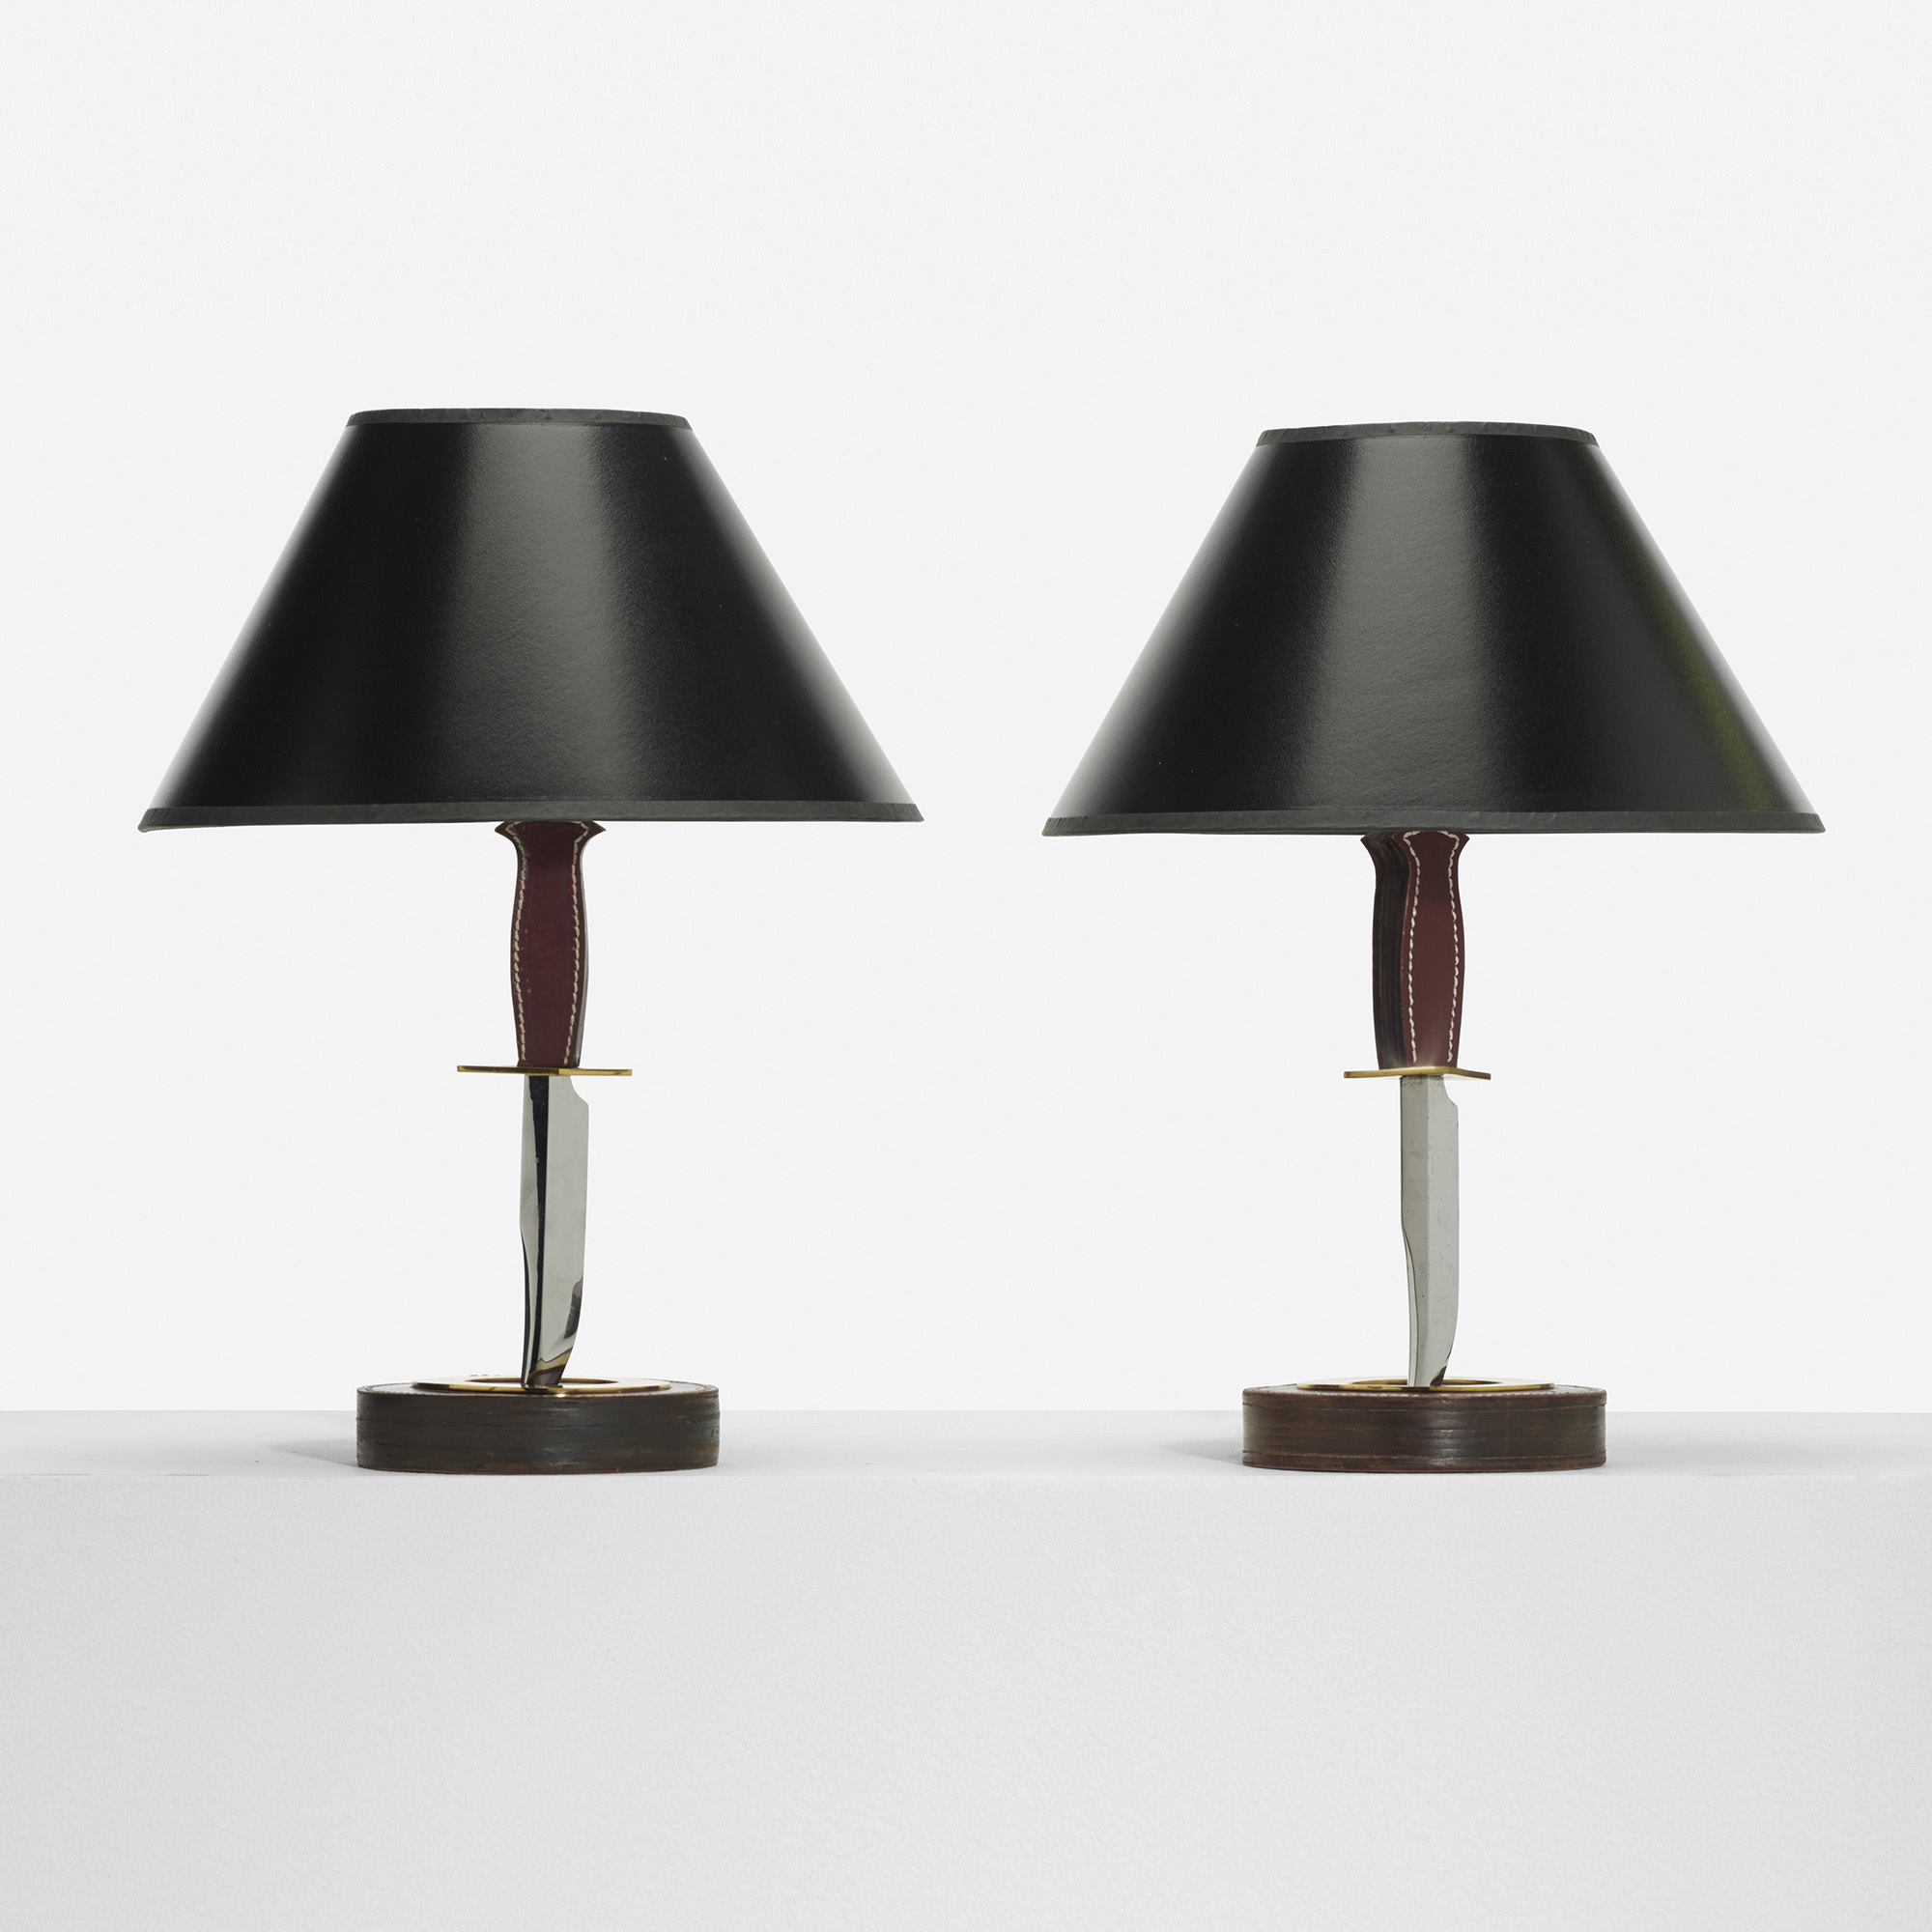 Fantastic 286 Hermes Table Lamps Pair Design 12 December 2013 Interior Design Ideas Inesswwsoteloinfo